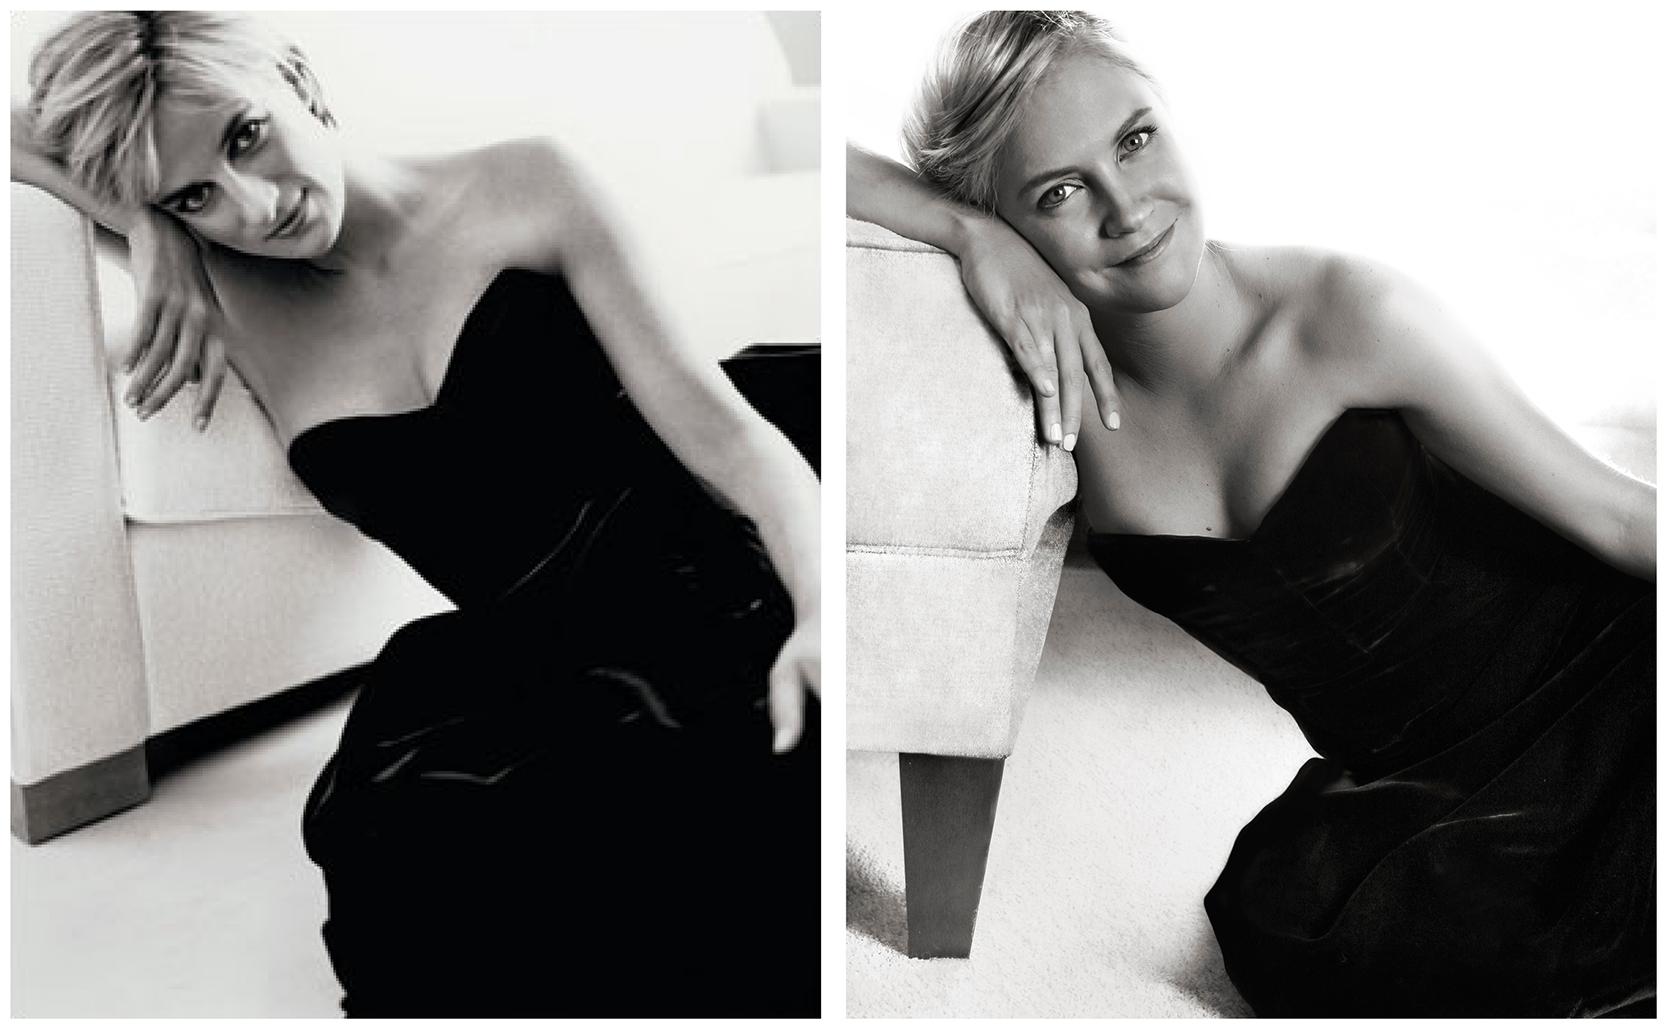 Princess Diana original photo side by side with replica photo